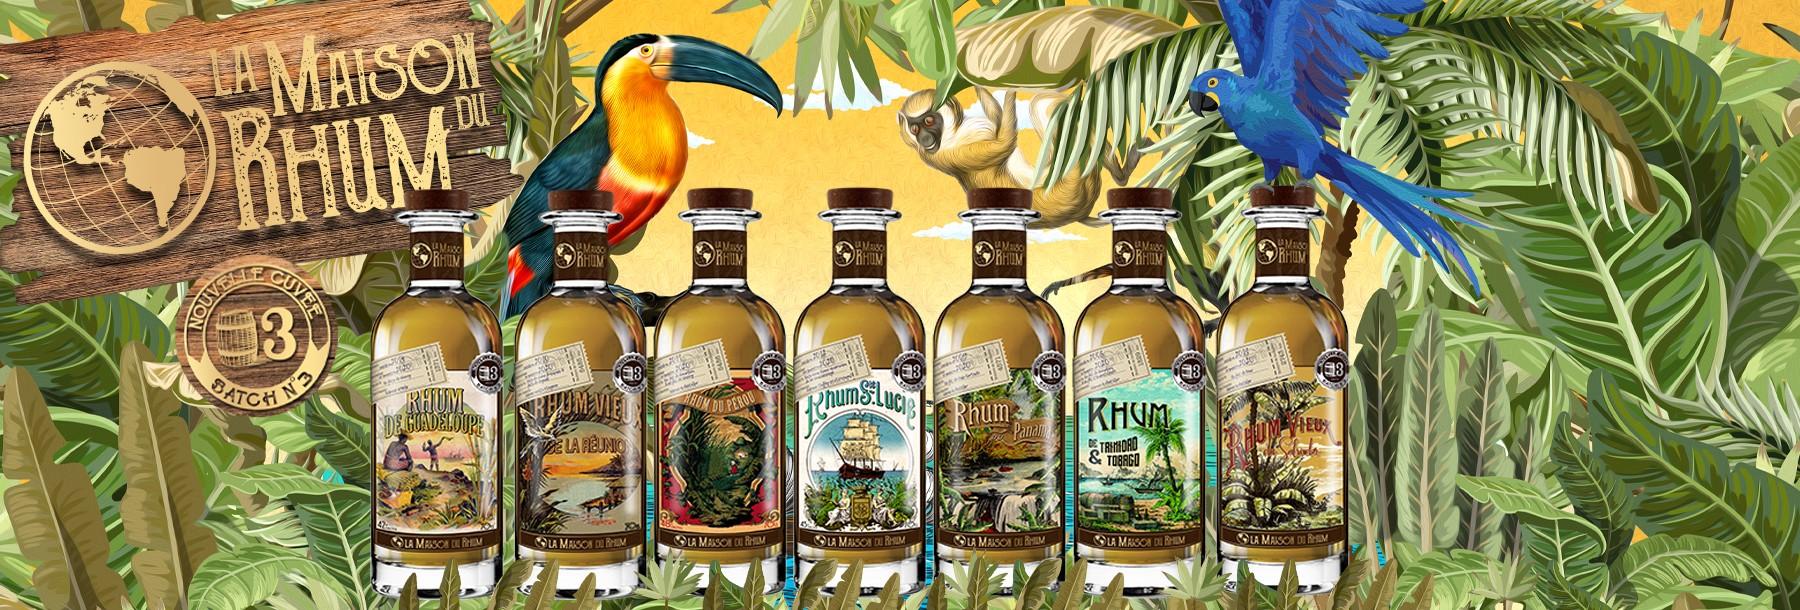 La Maison du Rhum Batch 3 Independent Bottling Rum